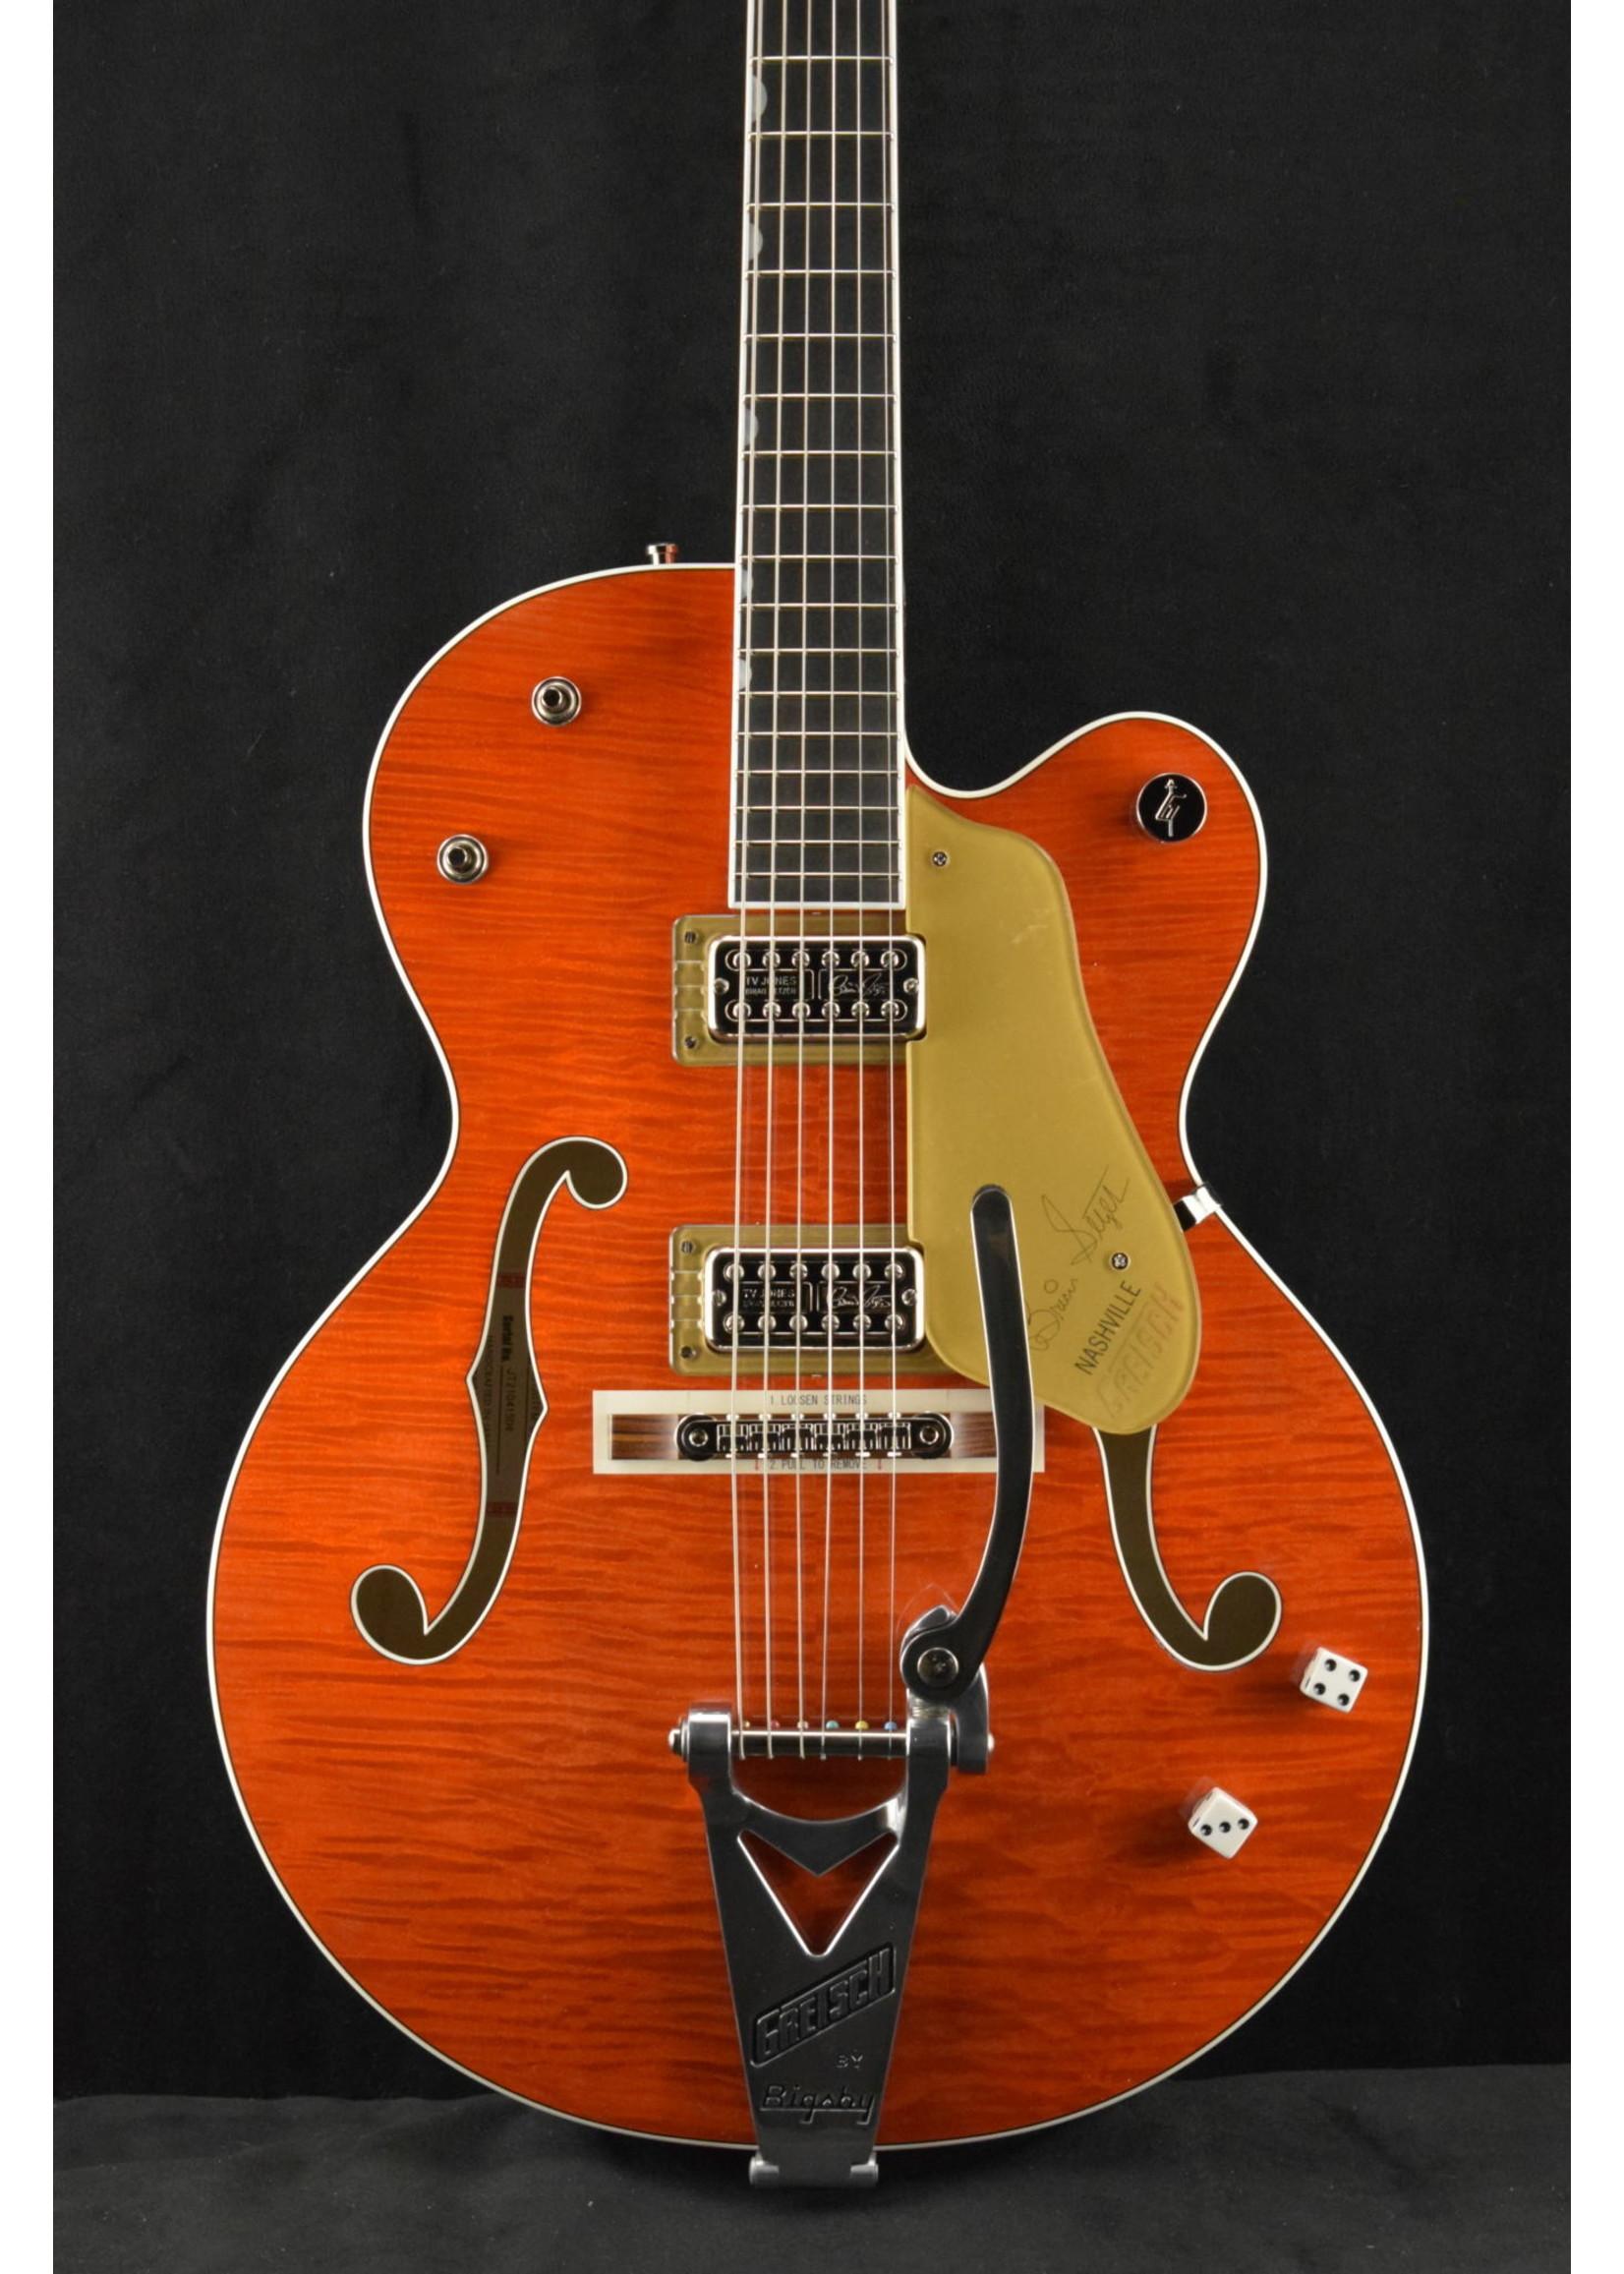 Gretsch Gretsch G6120TFM-BSNV Brian Setzer Signature Nashville® Hollow Body with Bigsby® and Flame Maple Orange Stain